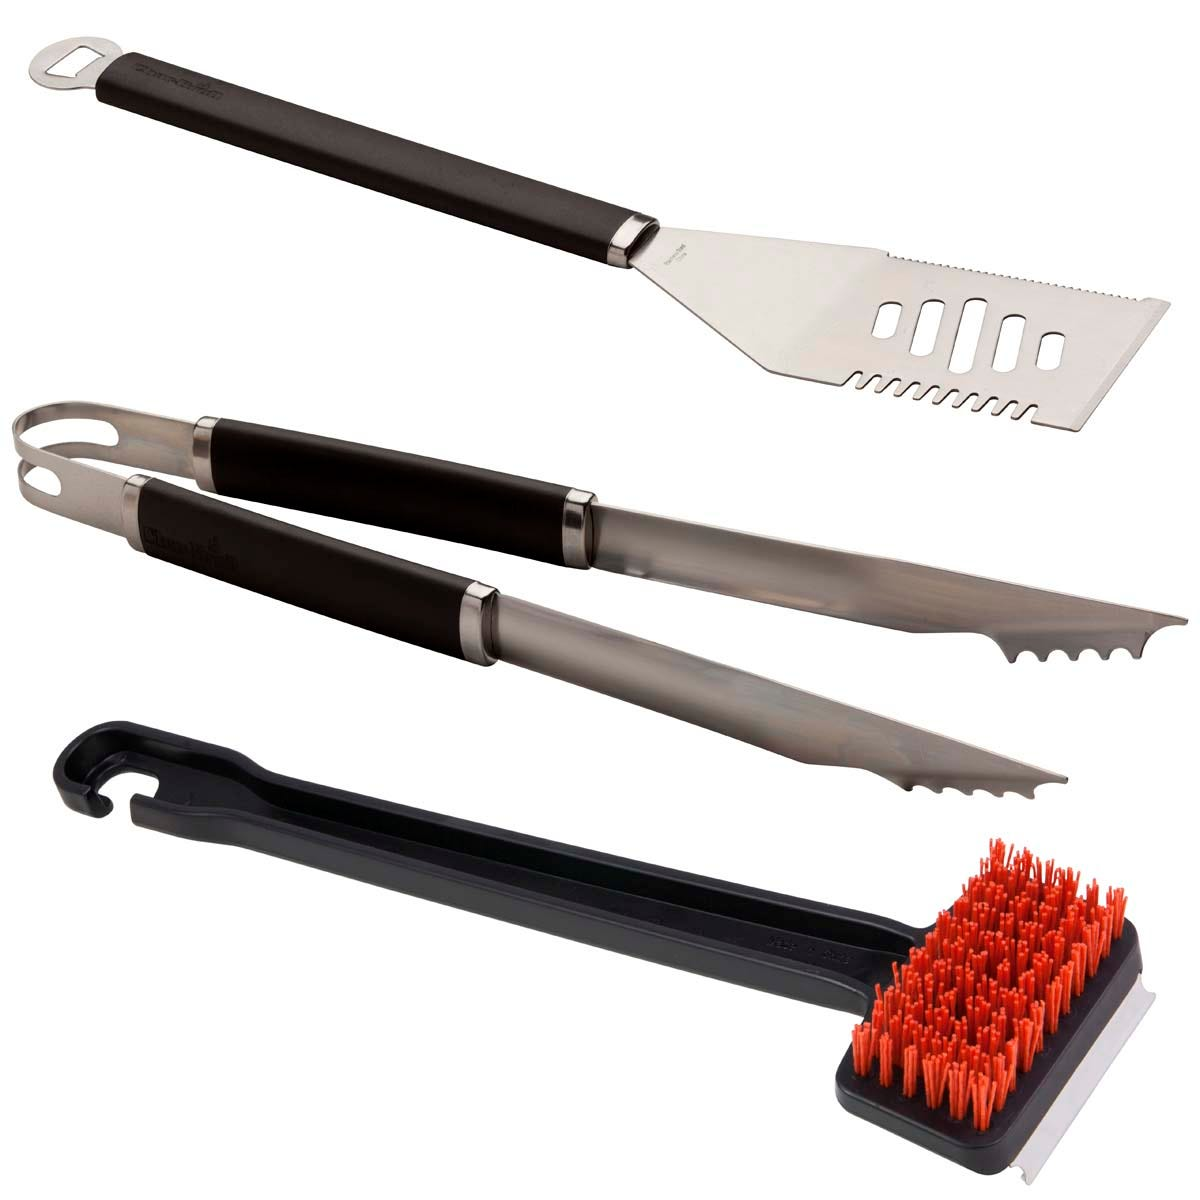 Char-Broil Beginners BBQ Tool Set